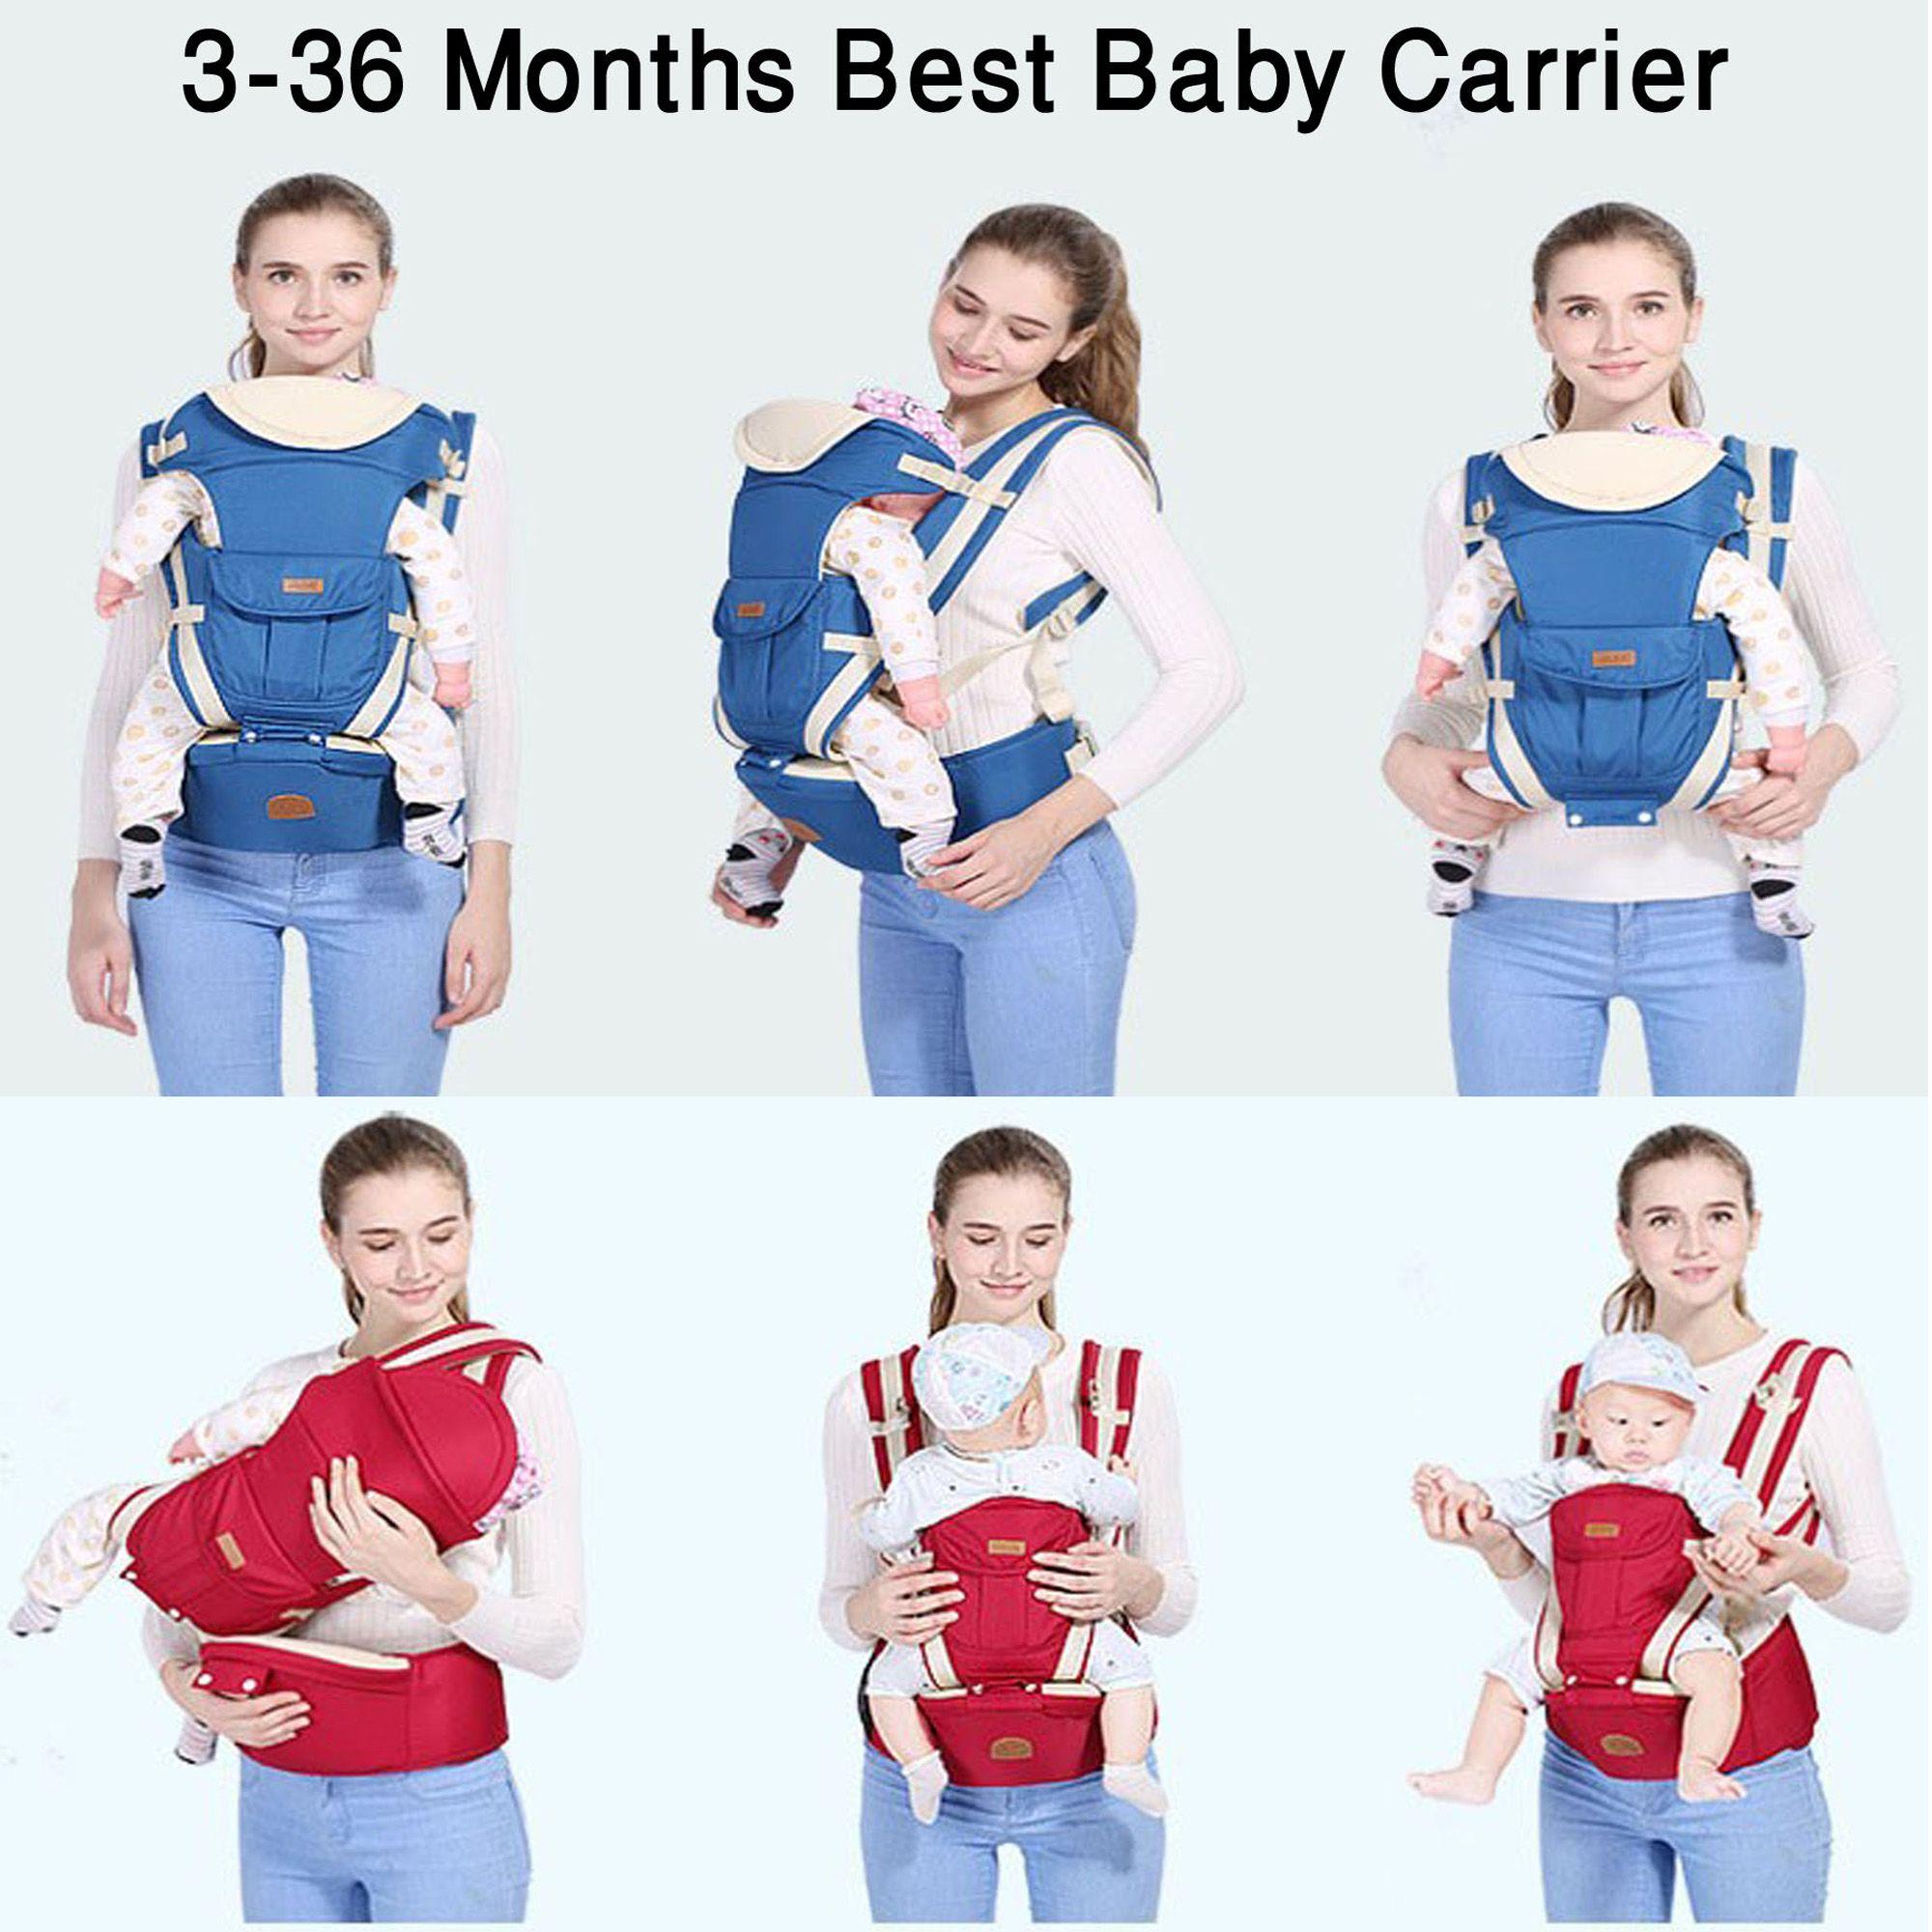 3 36 months best baby carrier for new born Ergonomic 360 infant